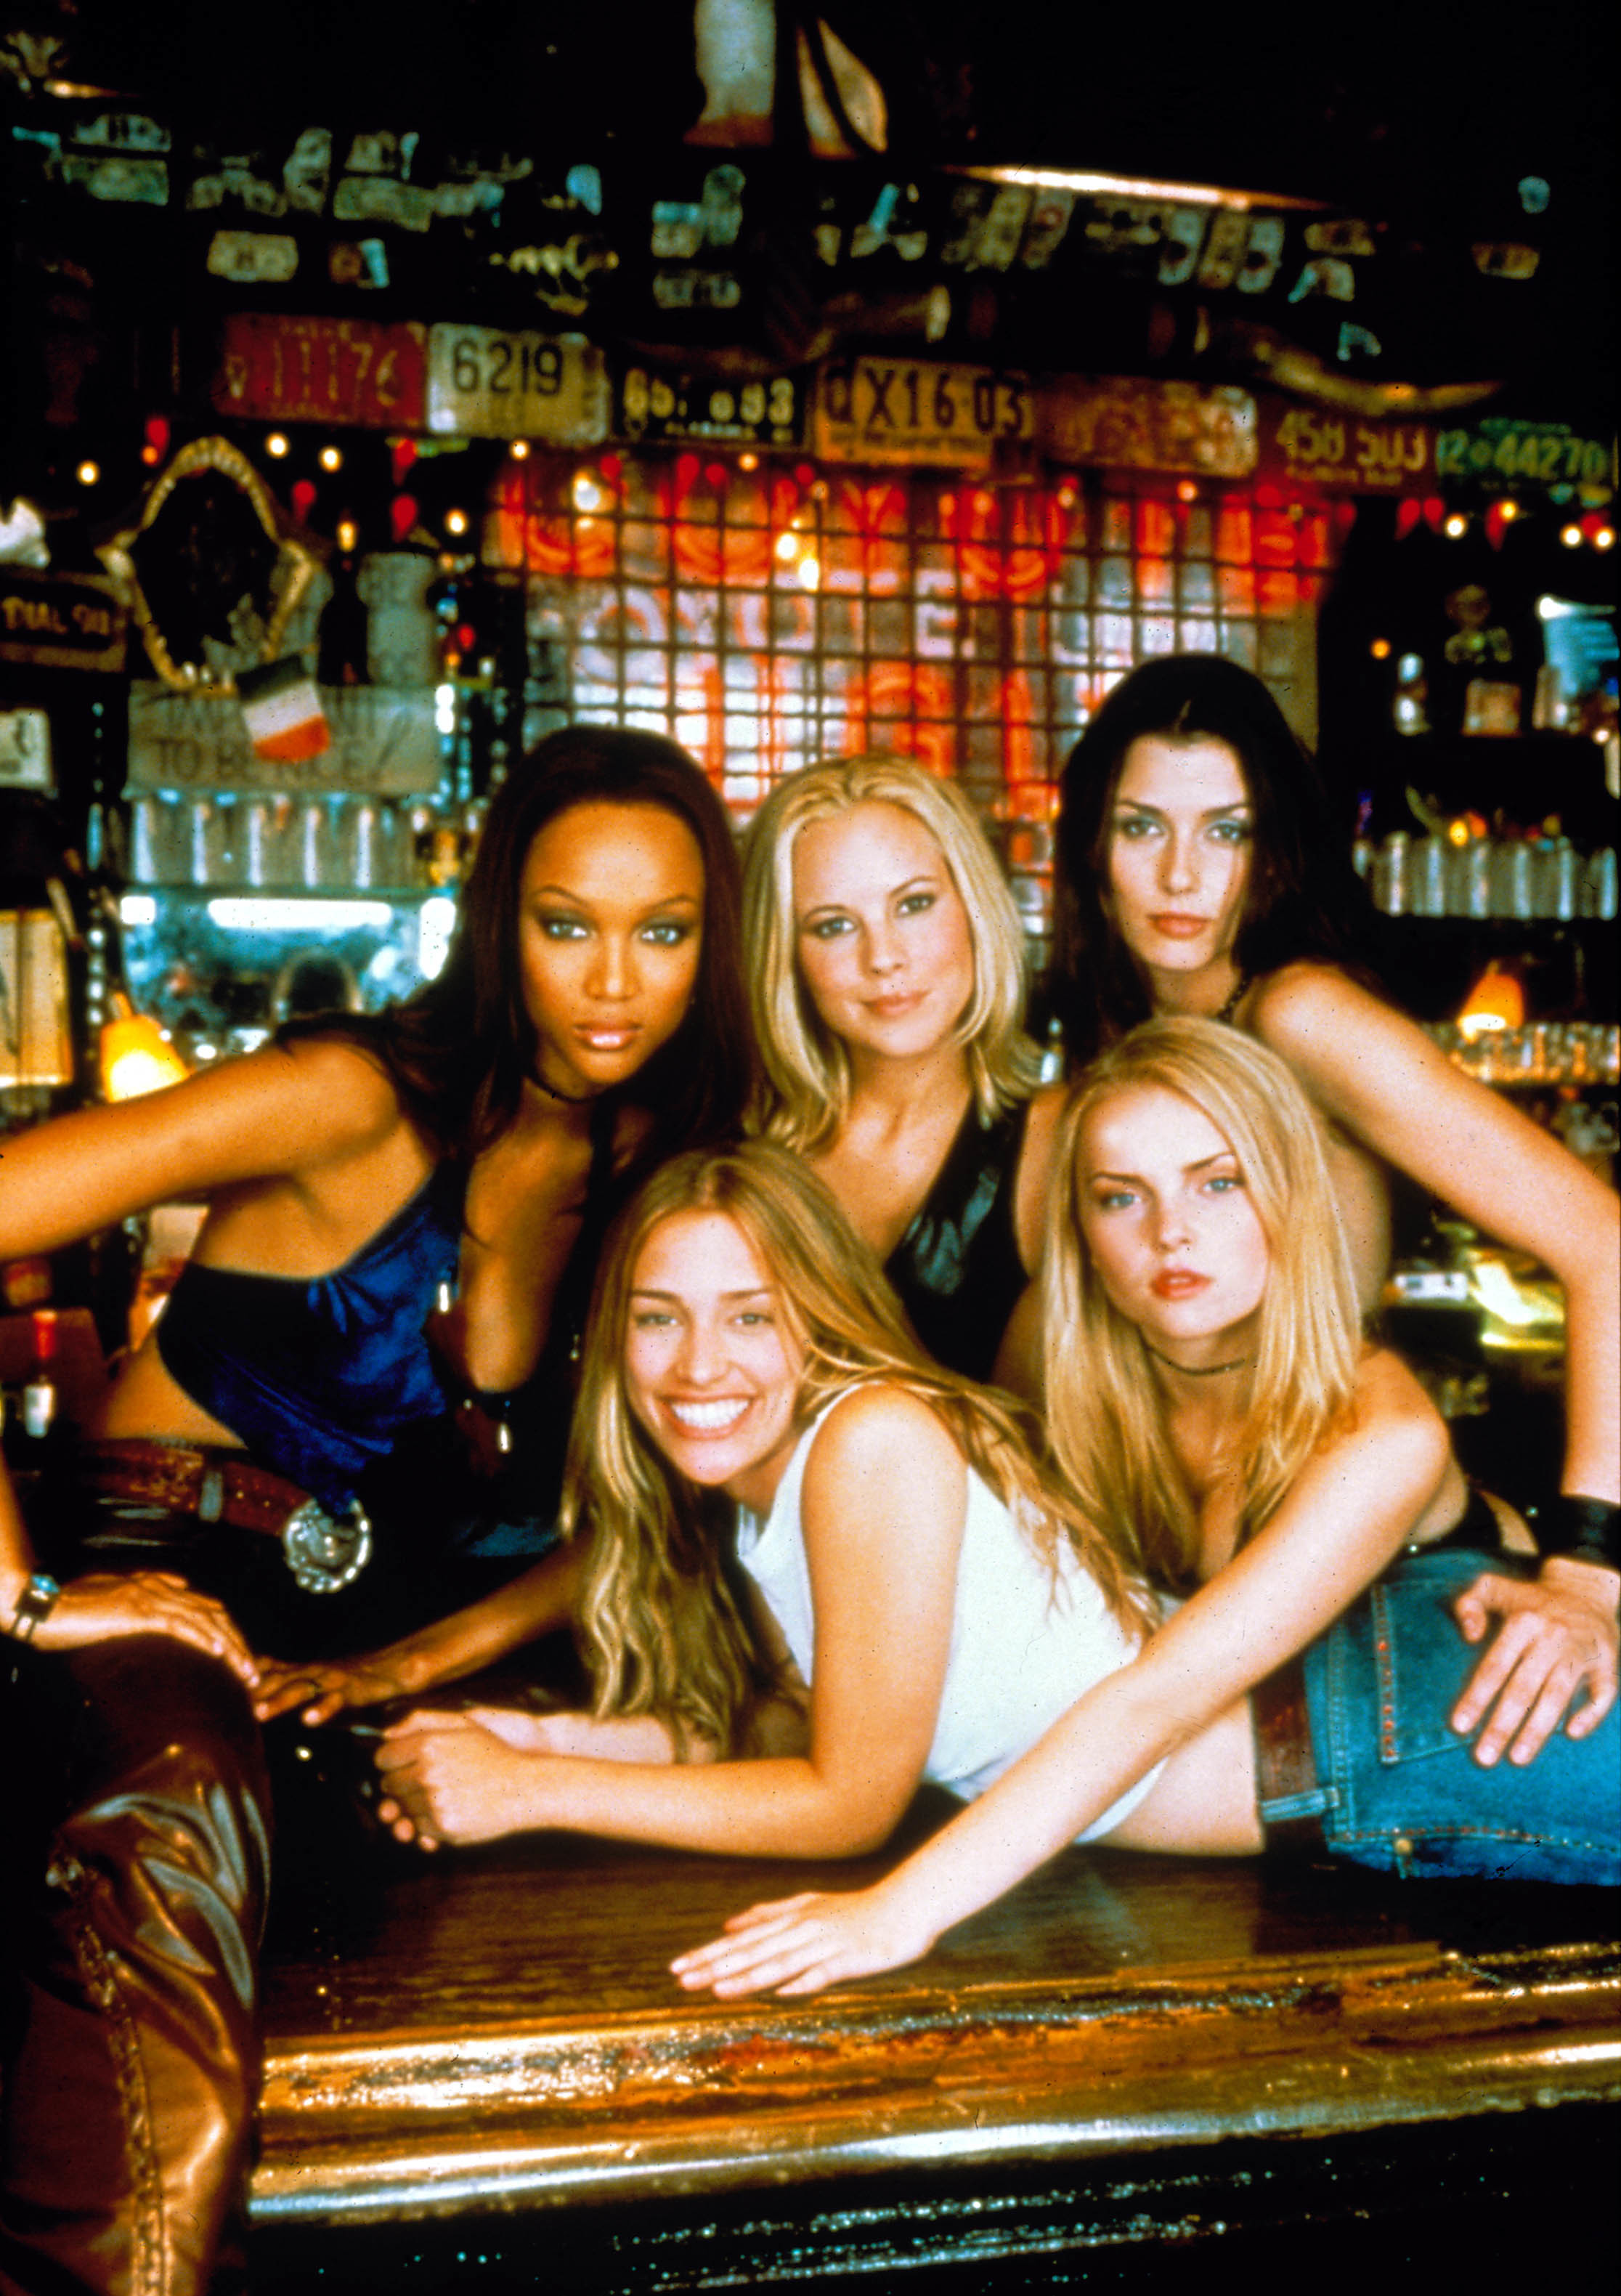 Coyote Ugly, Tyra Banks, Piper Perabo, Maria Bello, Bridget Moynahan, Izabella Miko